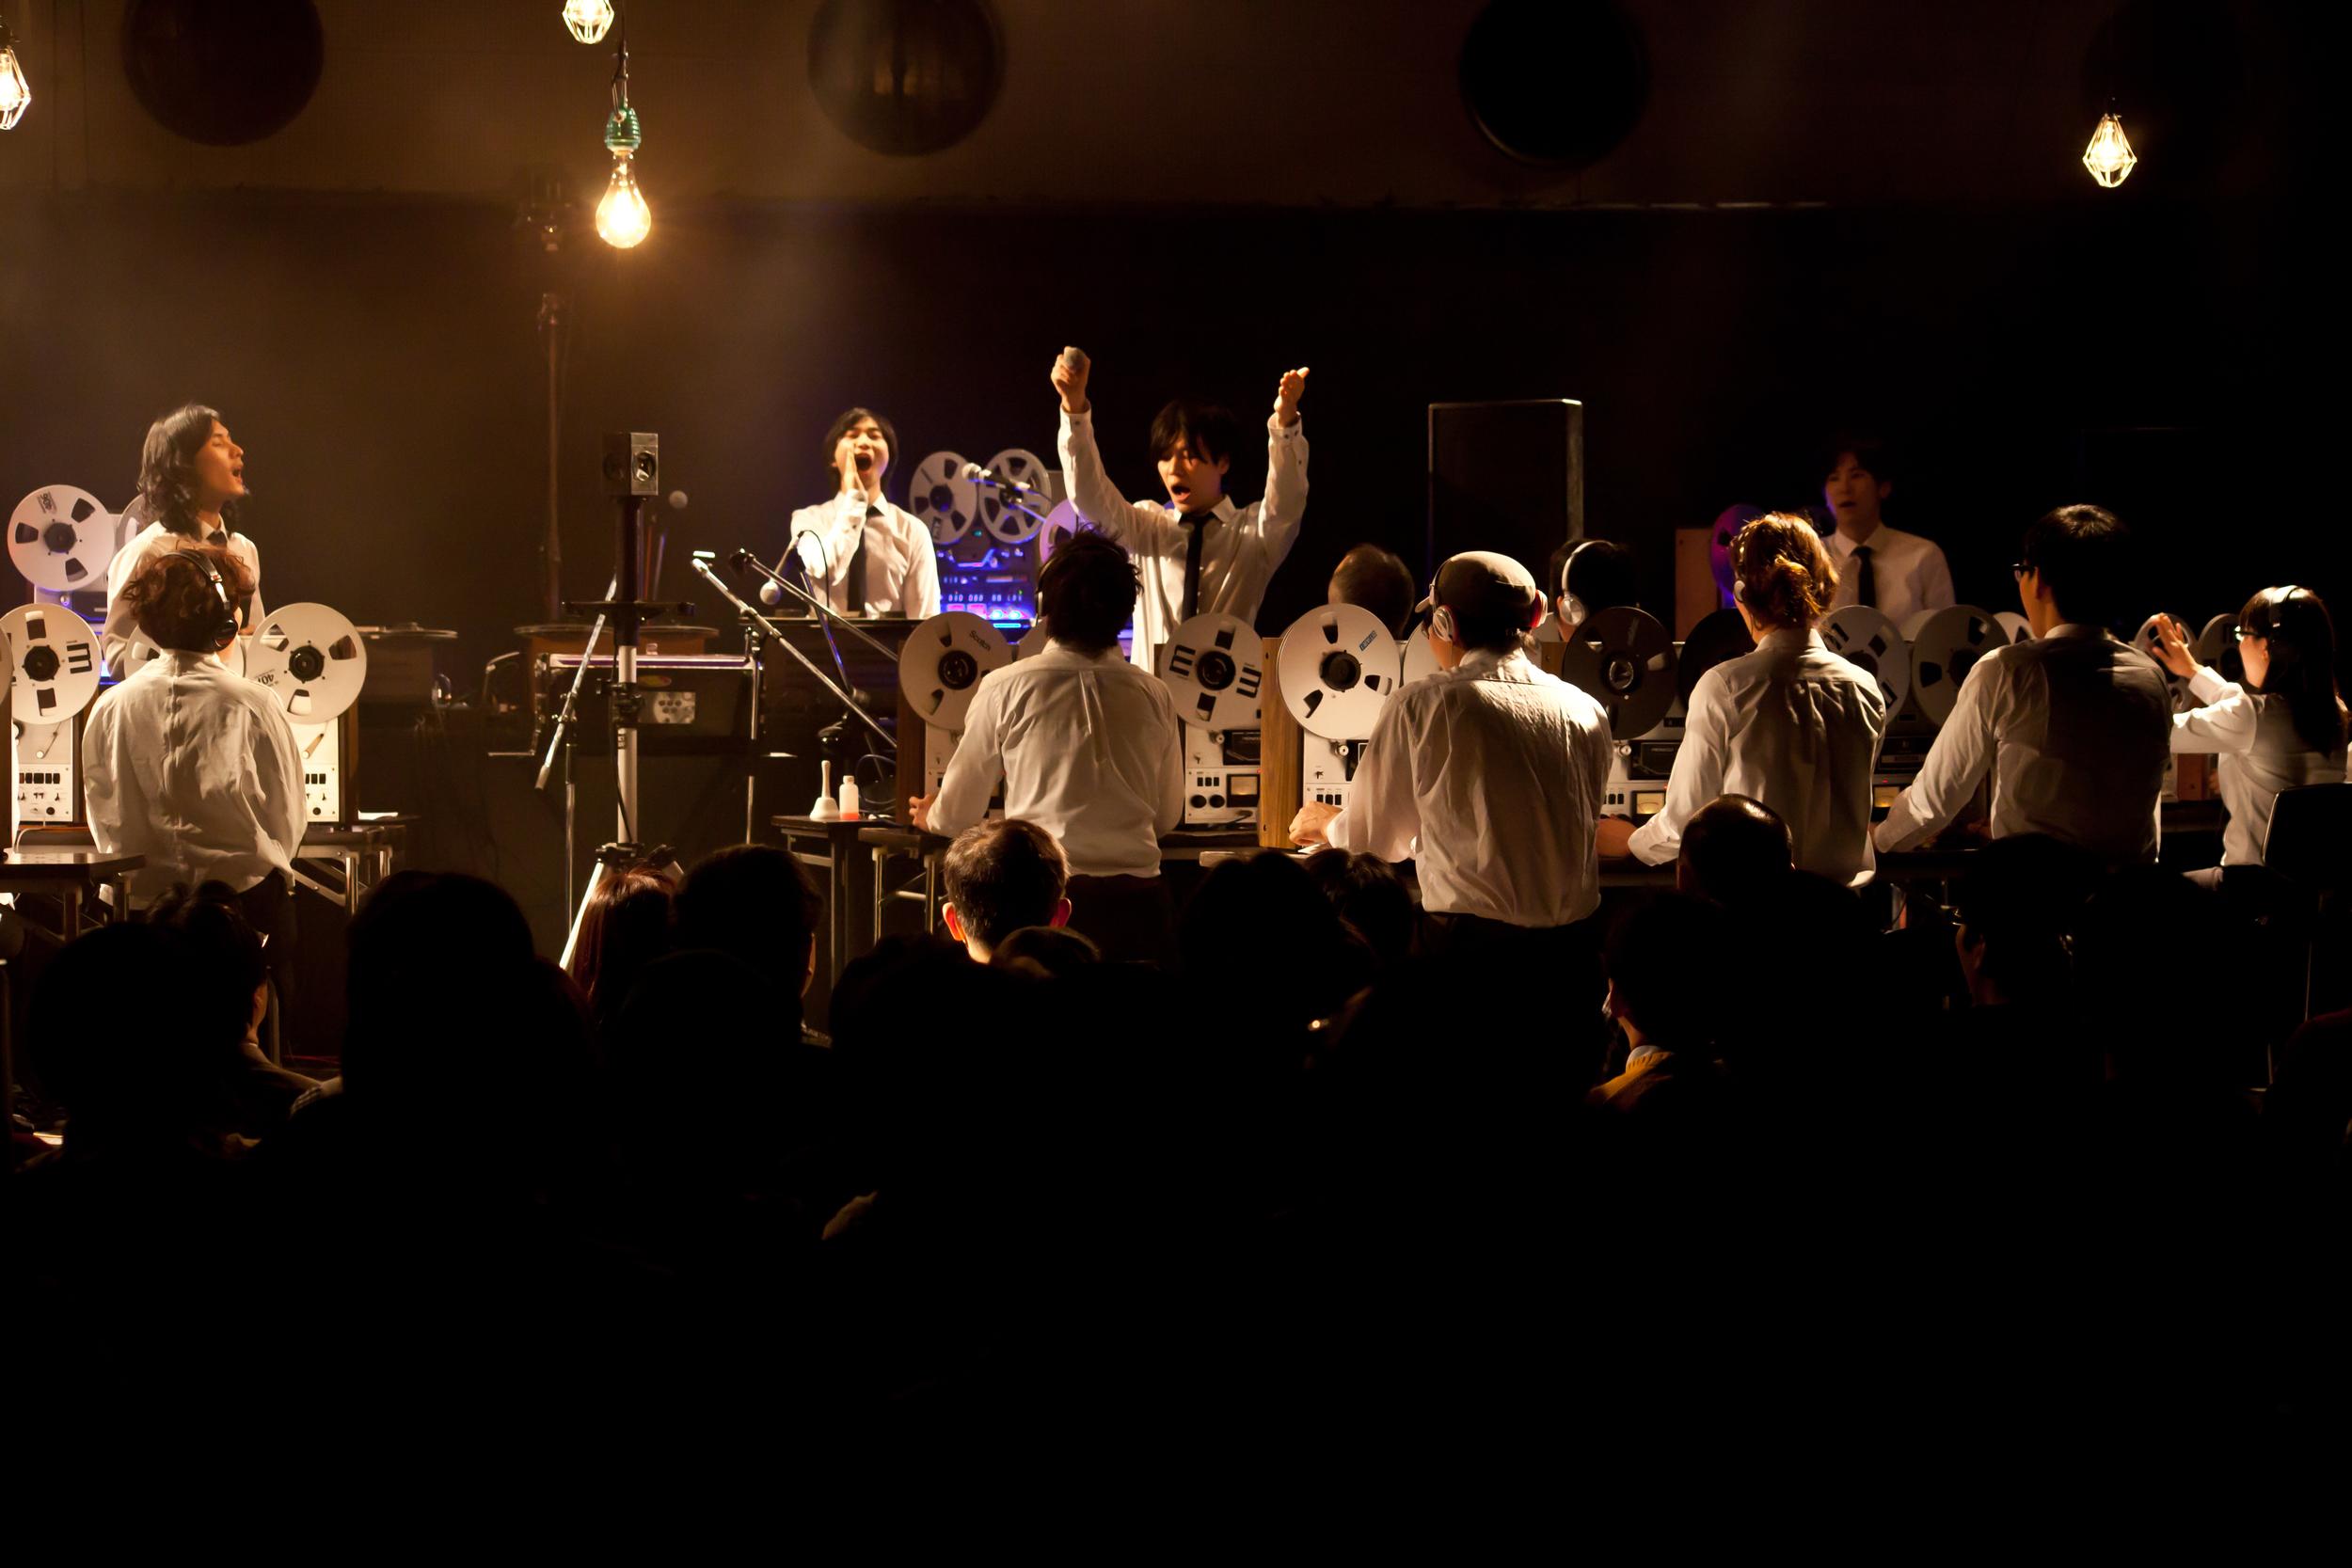 Photos by Masahiro Hasunuma